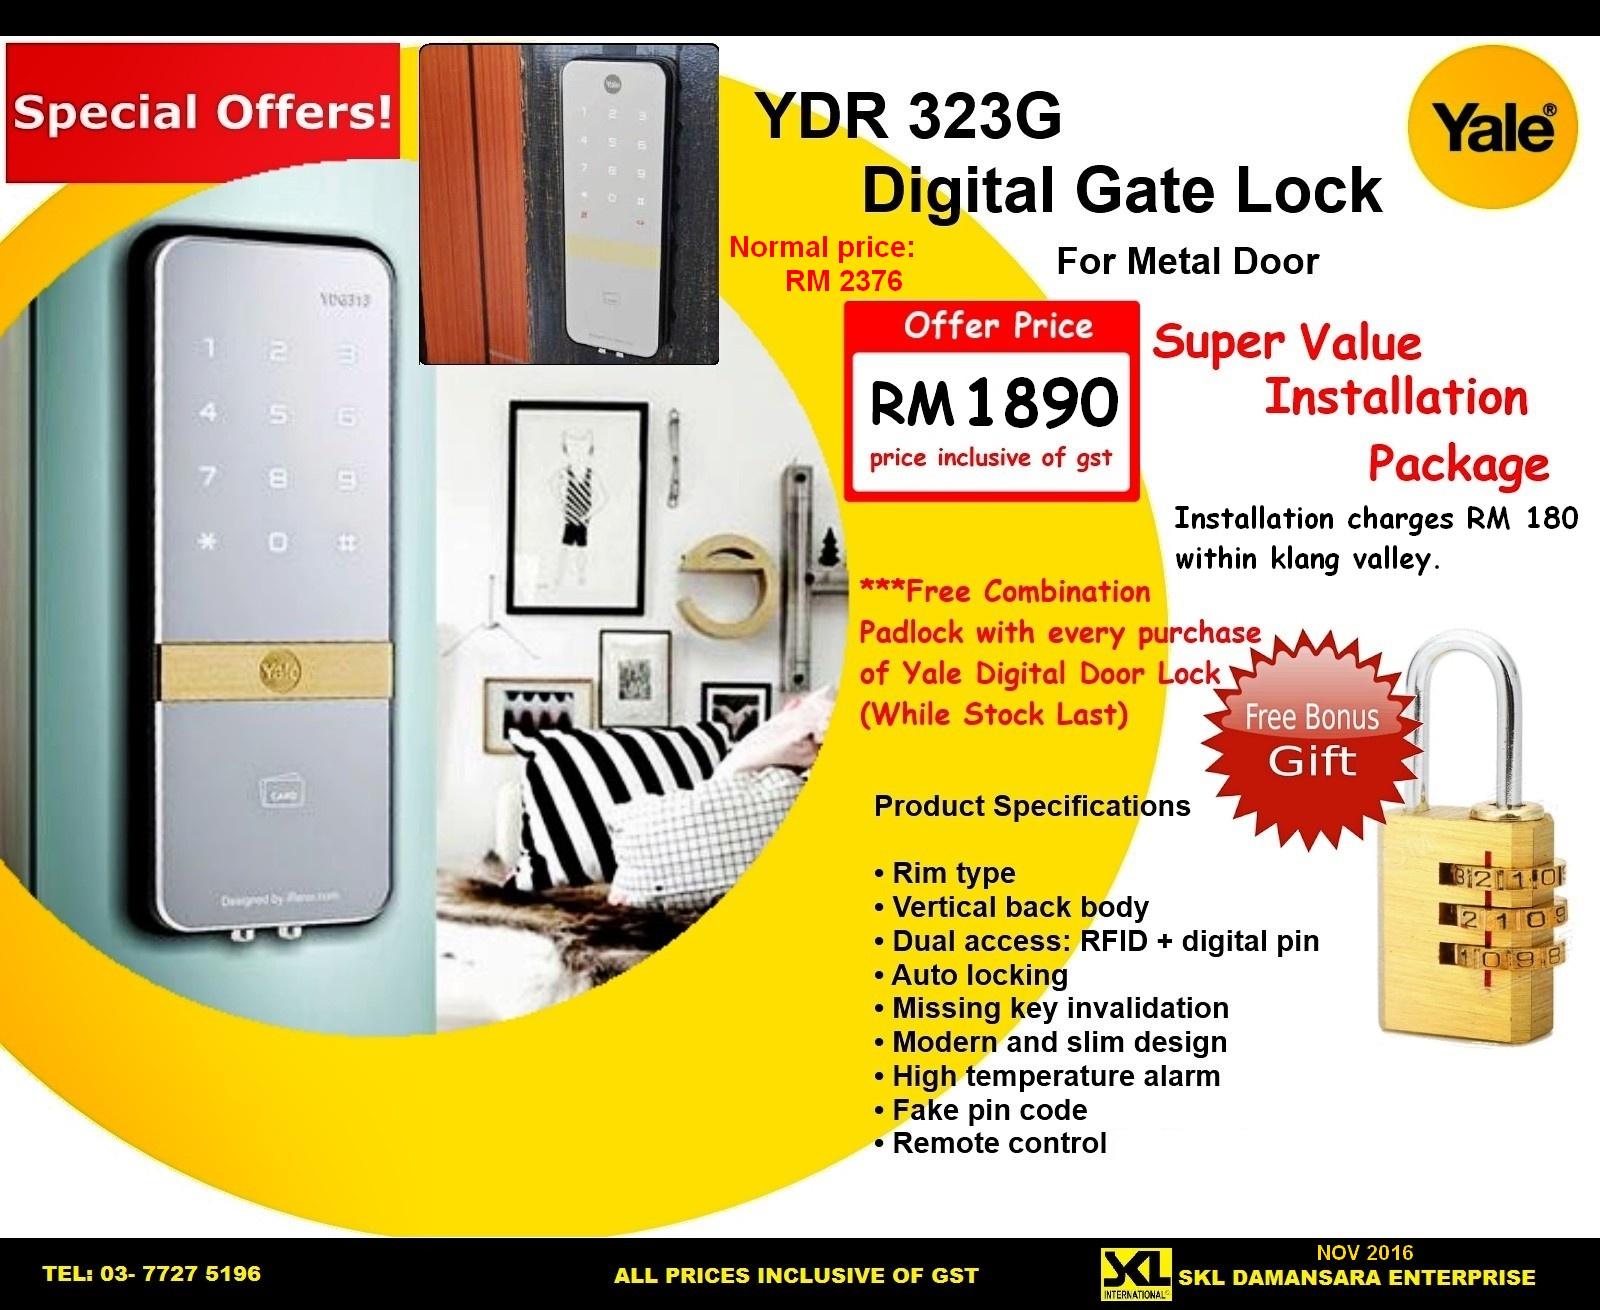 door digital lifestyle solutions deter eurovigil lock ock doors ydr security forbes i yale eureka